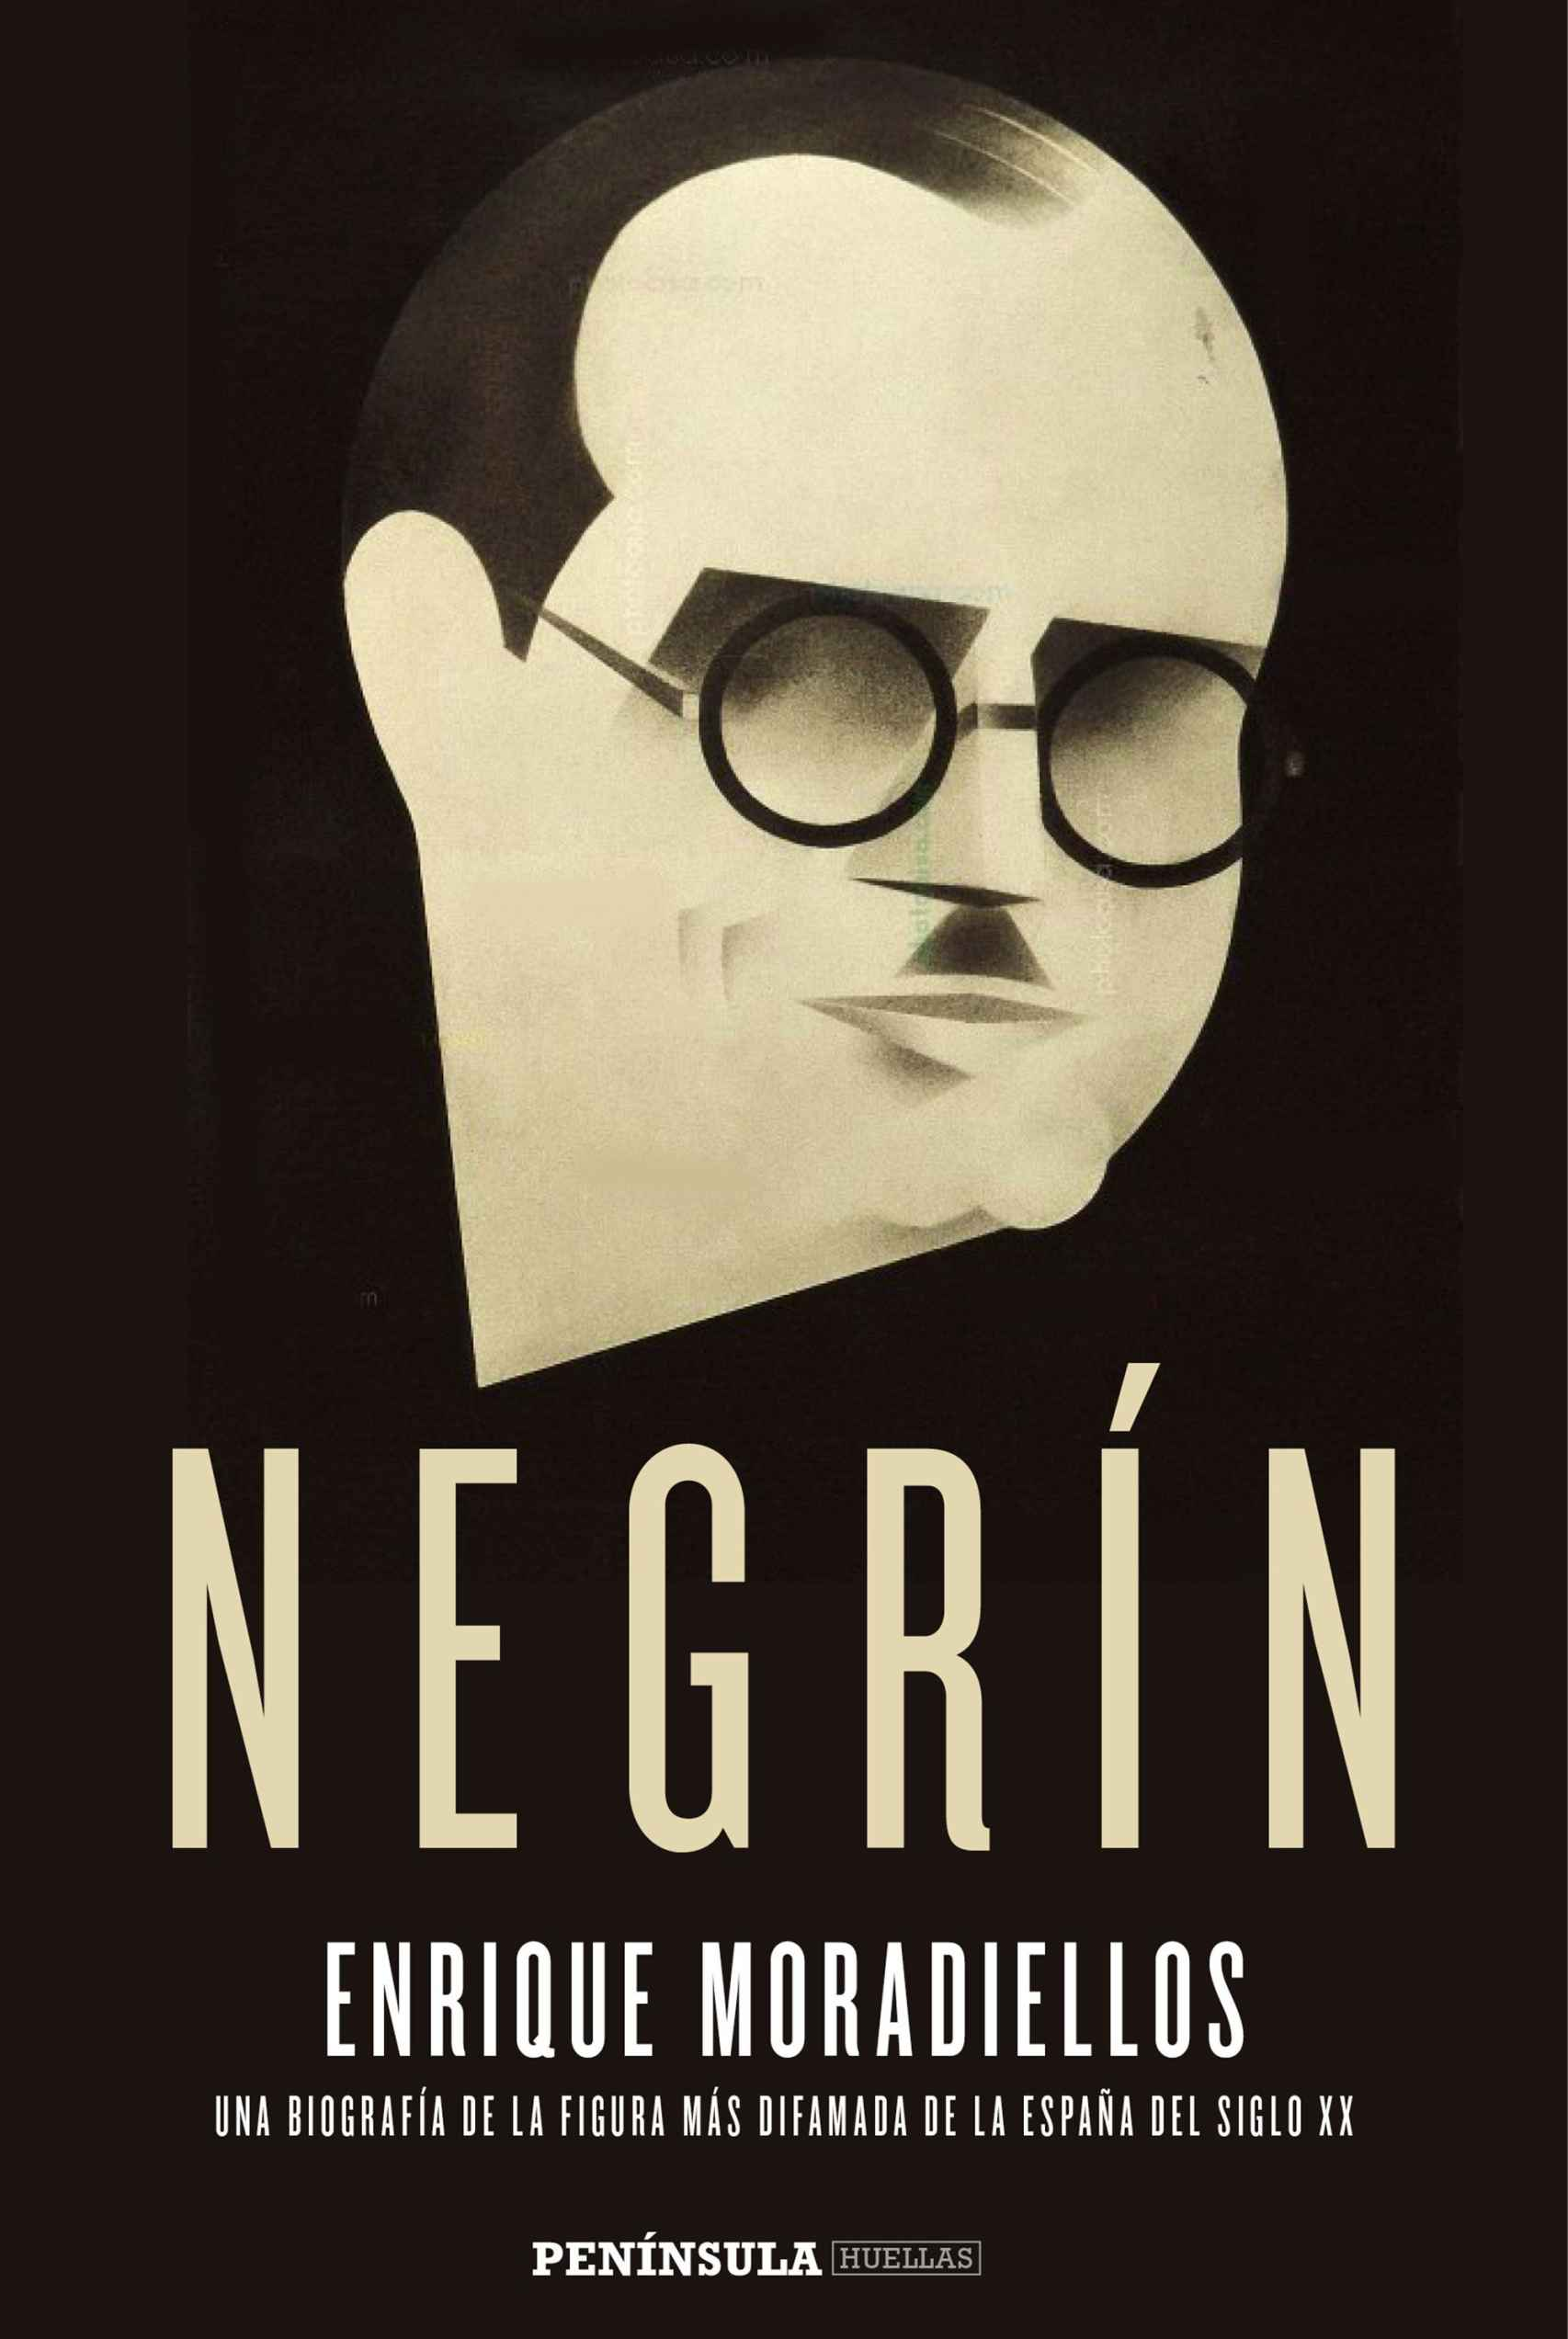 Portada de la edición de 2015 de 'Negrín'.